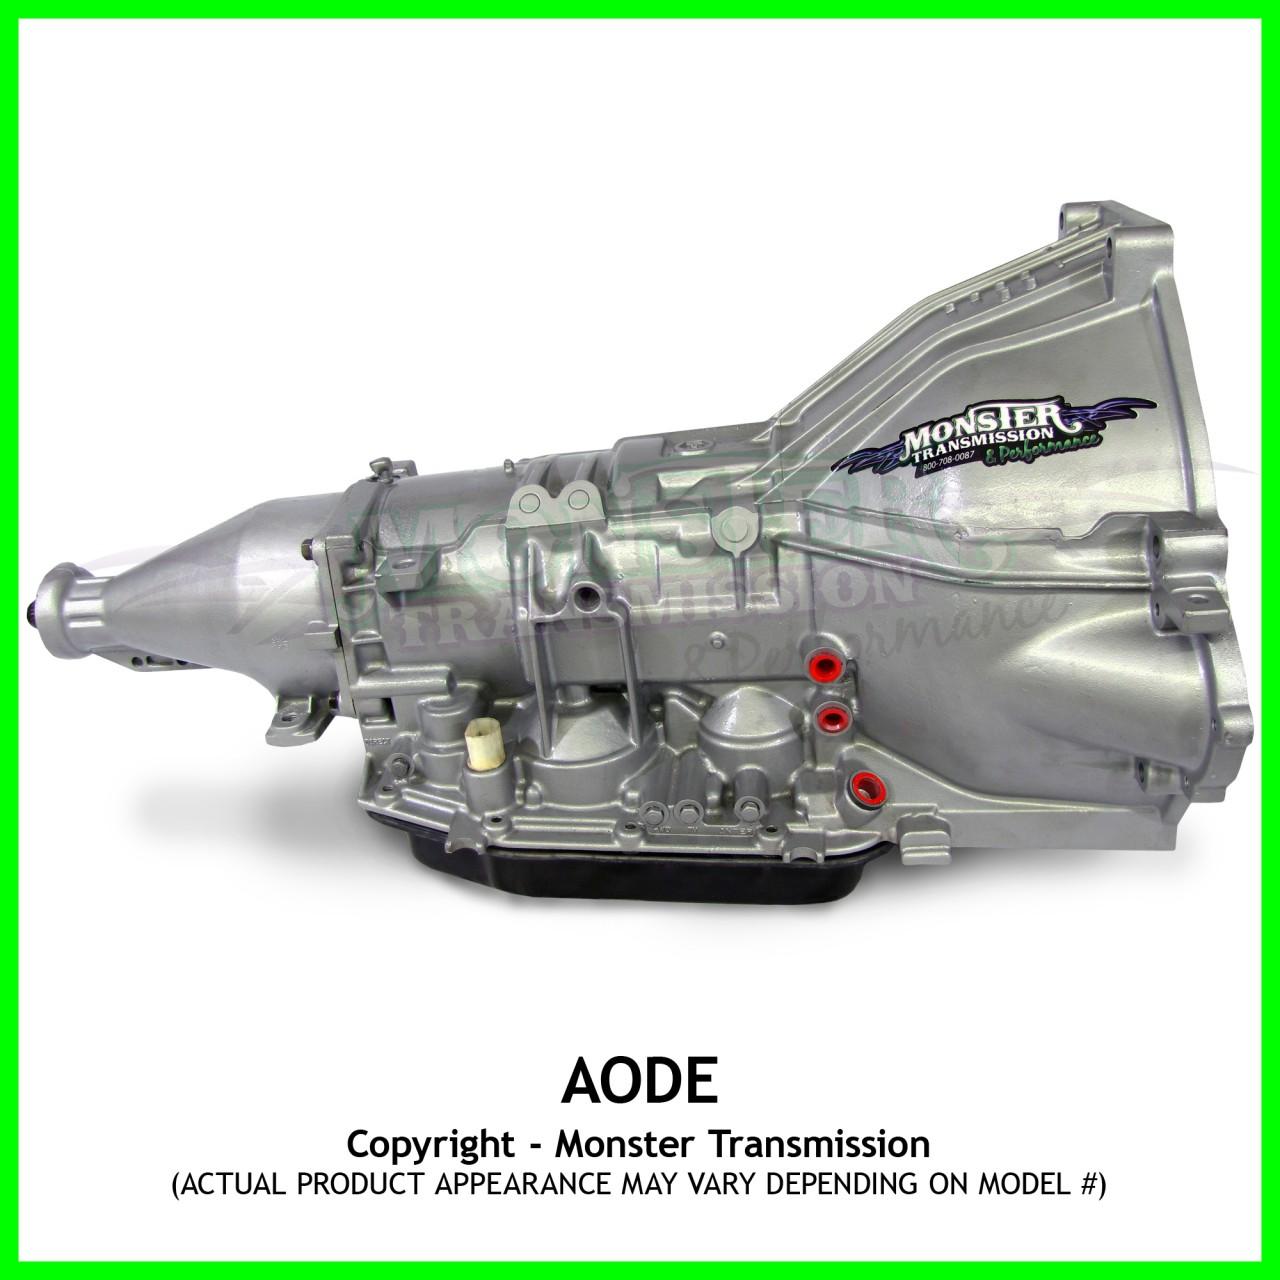 AODE Transmission Remanufactur...